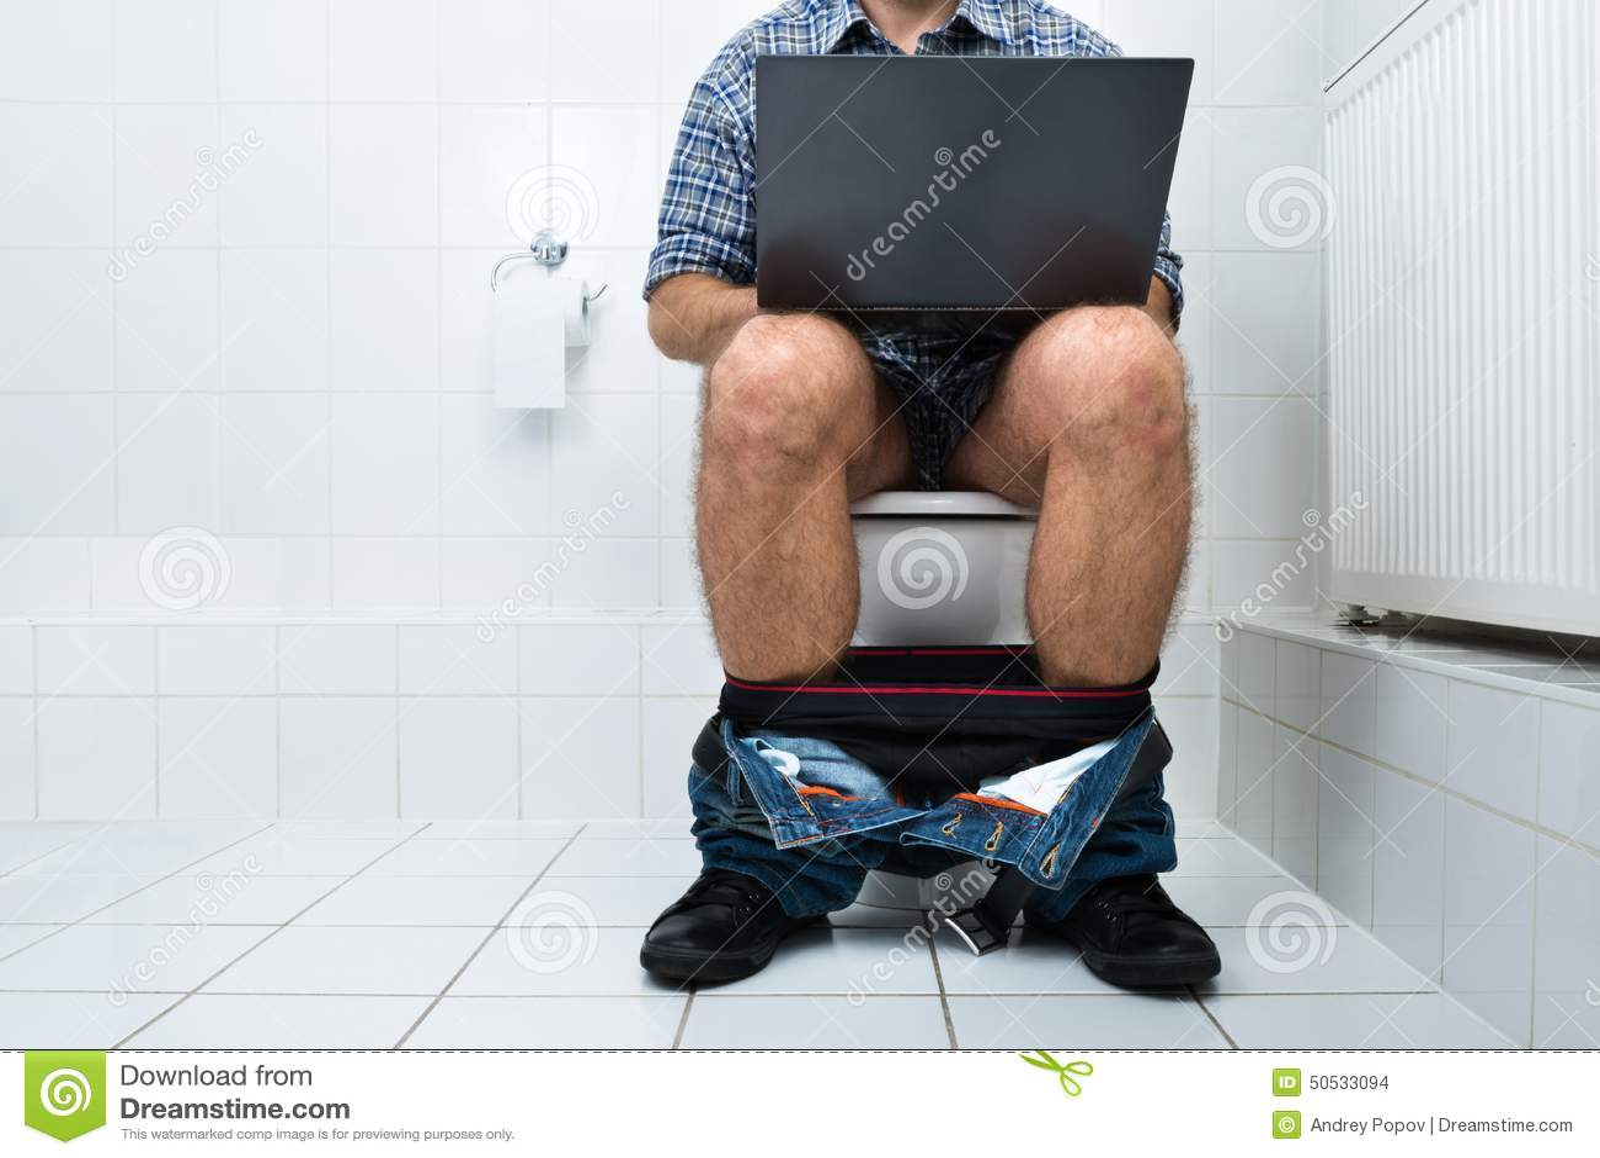 Man In Toilet Using Laptop Stock Photo Image Of